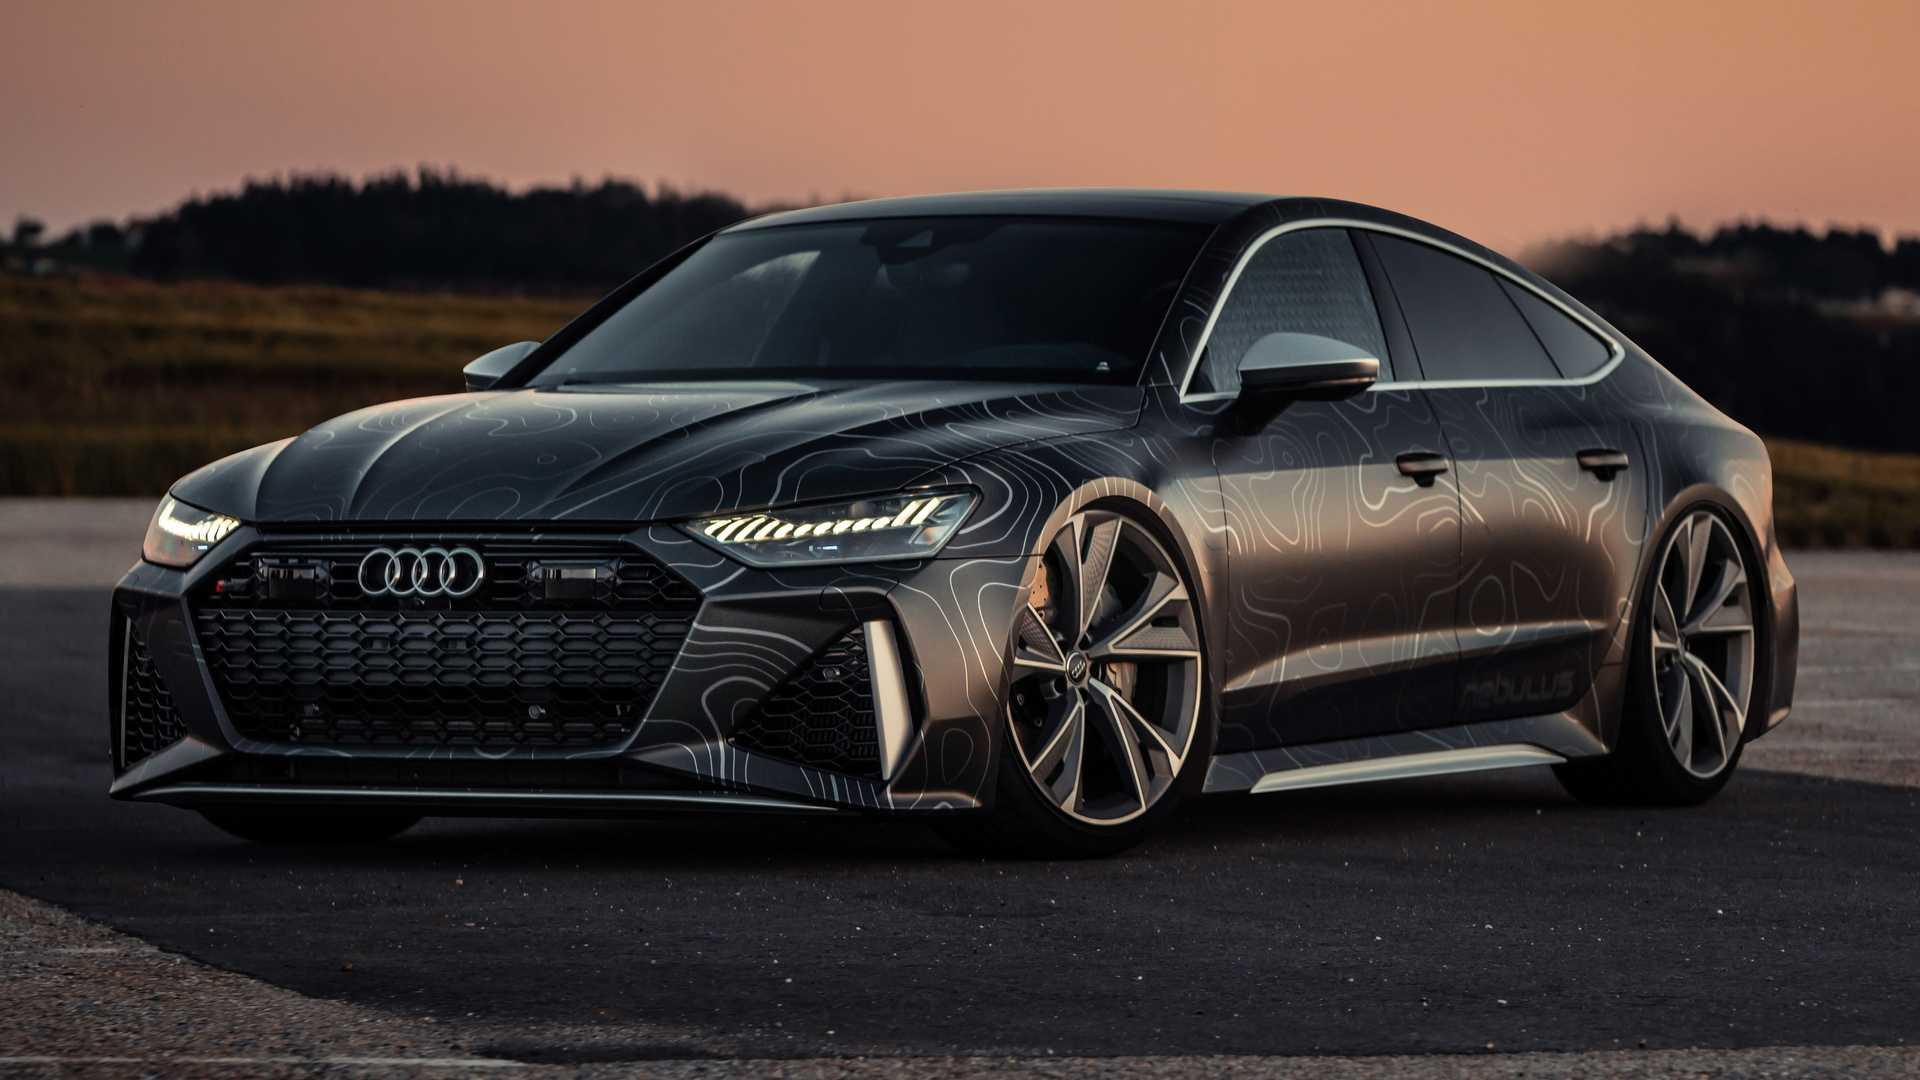 Audi-RS7-By-Black-Box-Richter-6